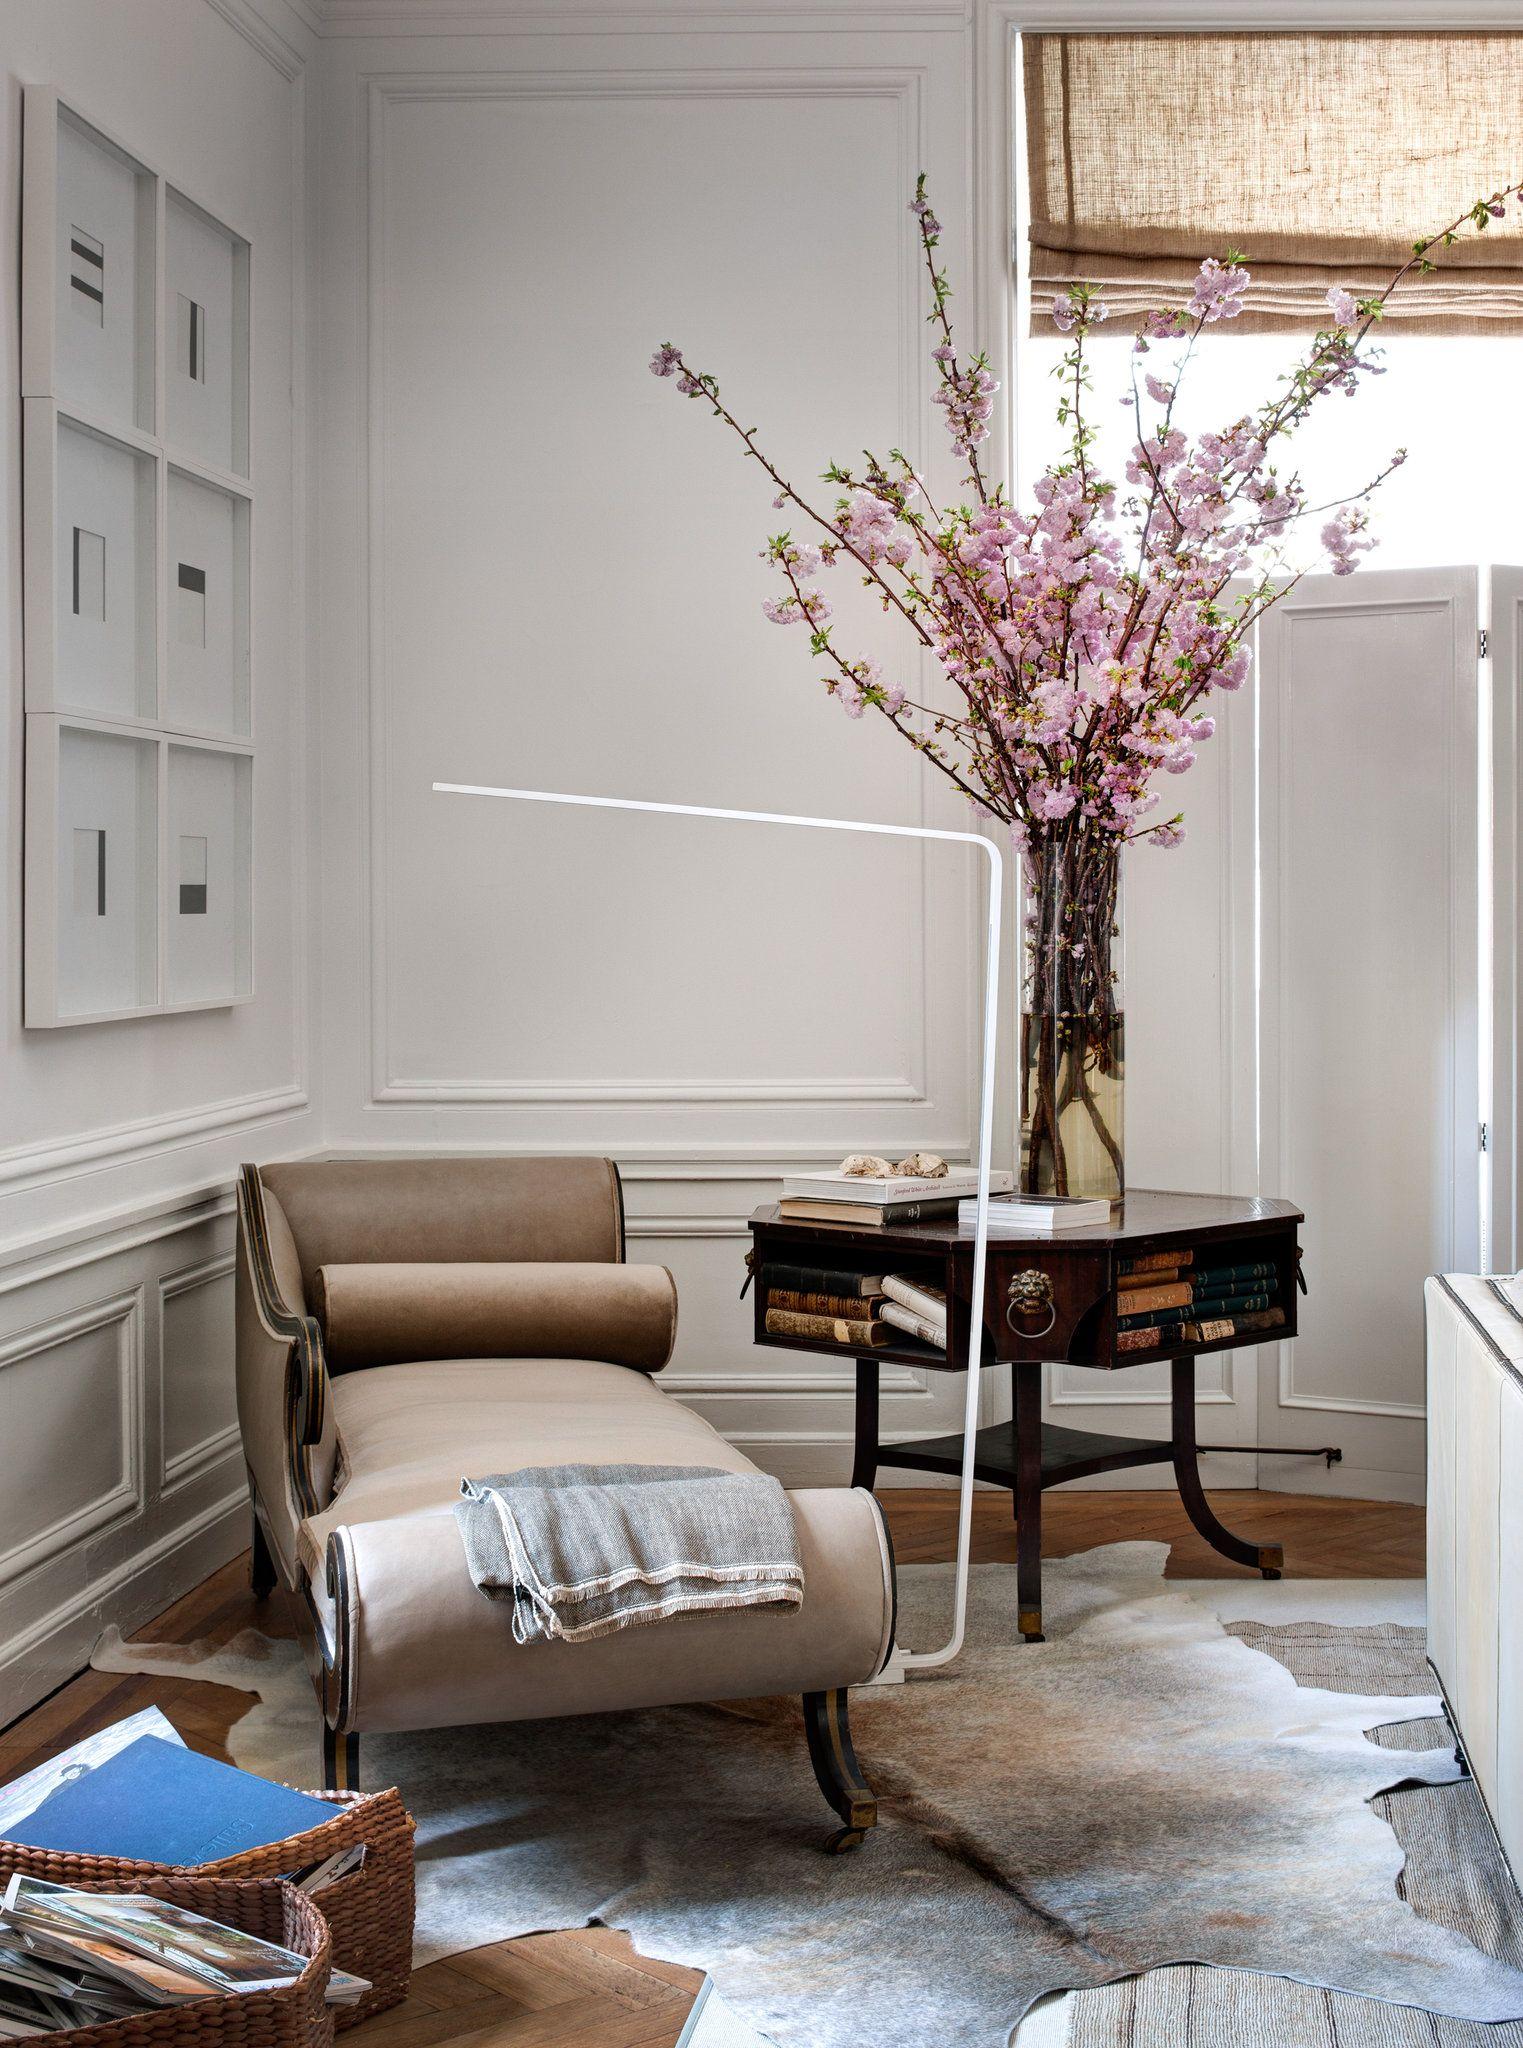 Interior, Living Room Remodel, Decor